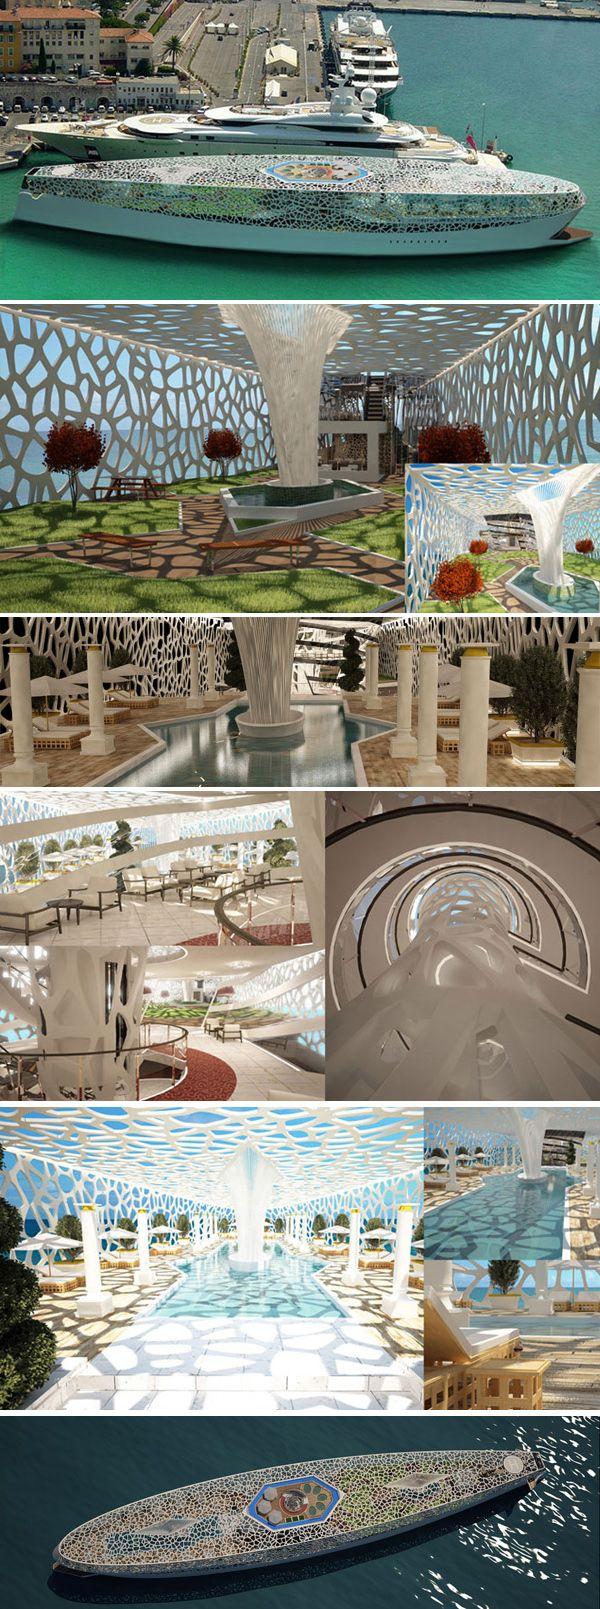 Voronoi the Algorithmic Design Floating Mega-Yacht Paradise concept by Hyun-Seok Kim